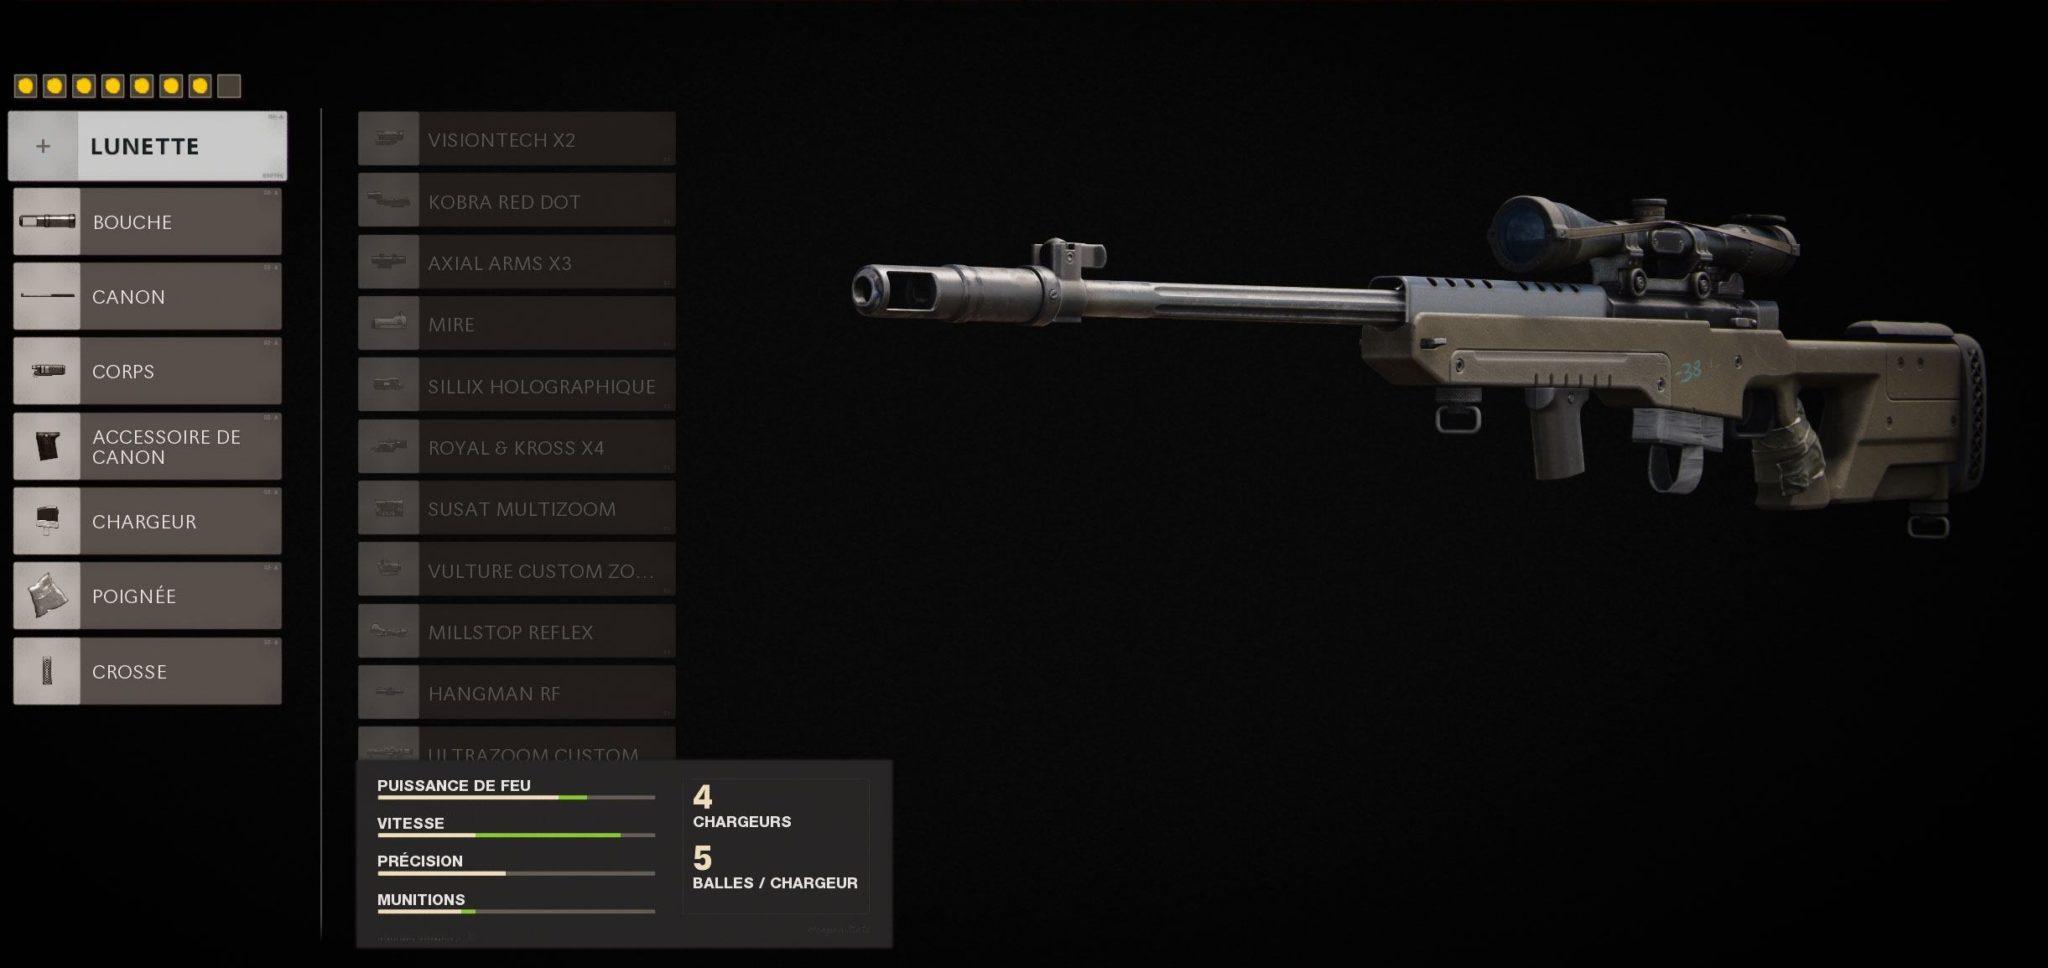 classe Black Ops Cold War LW3 Tundra Treyarch